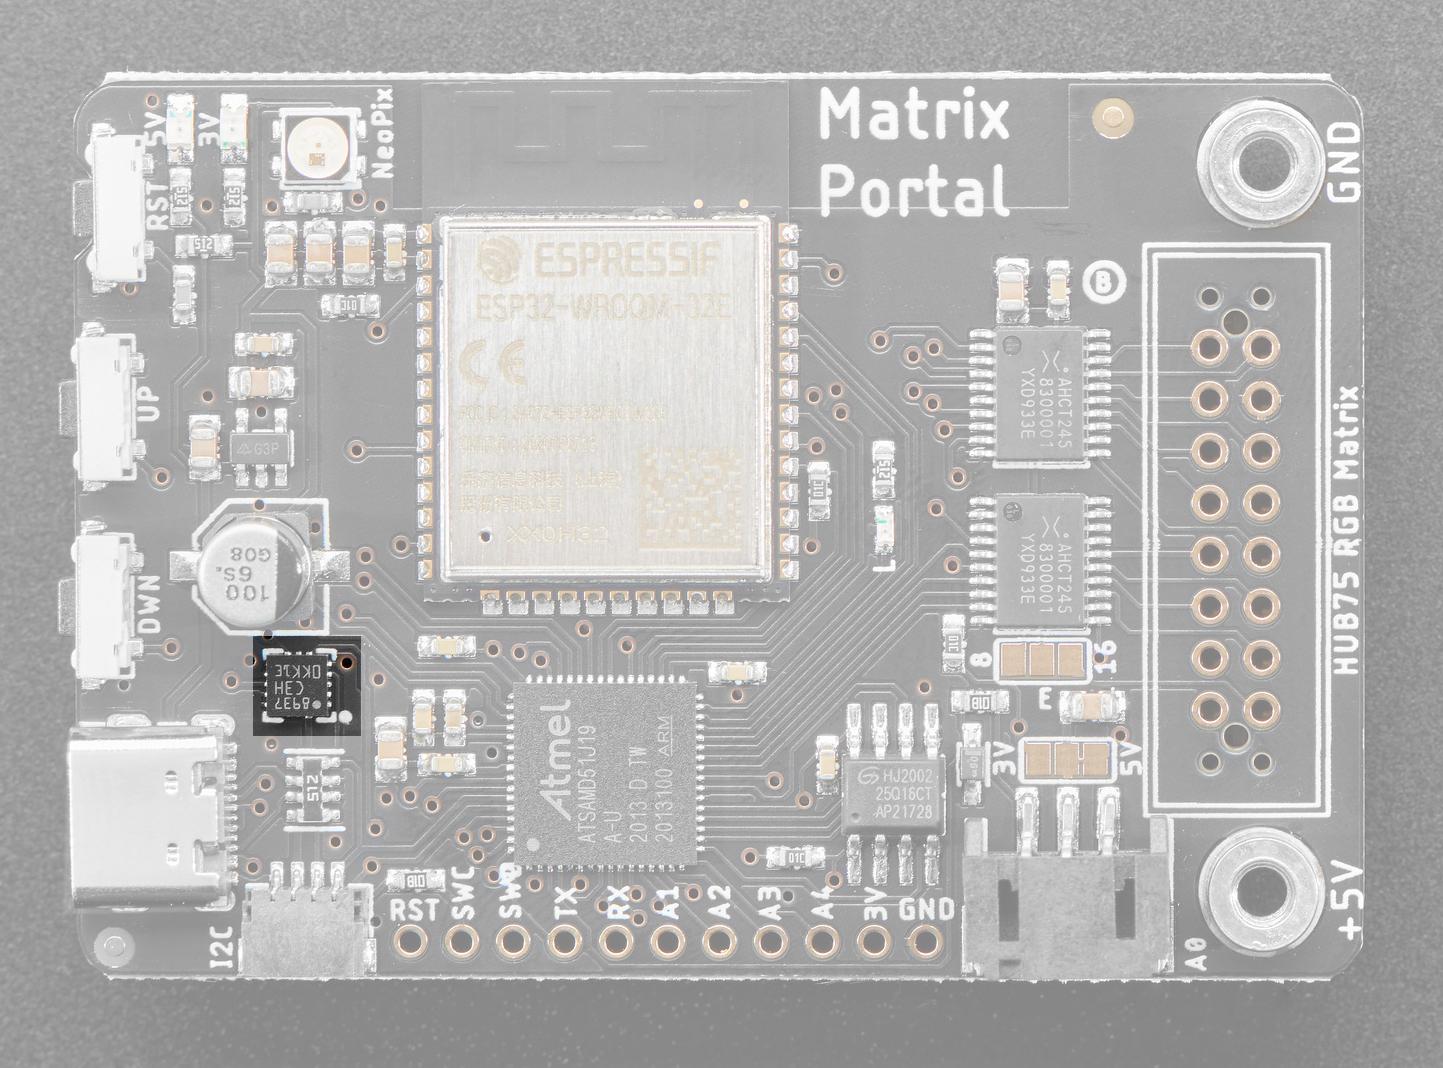 led_matrices_matrixportal_pinout_accelerometer.jpg